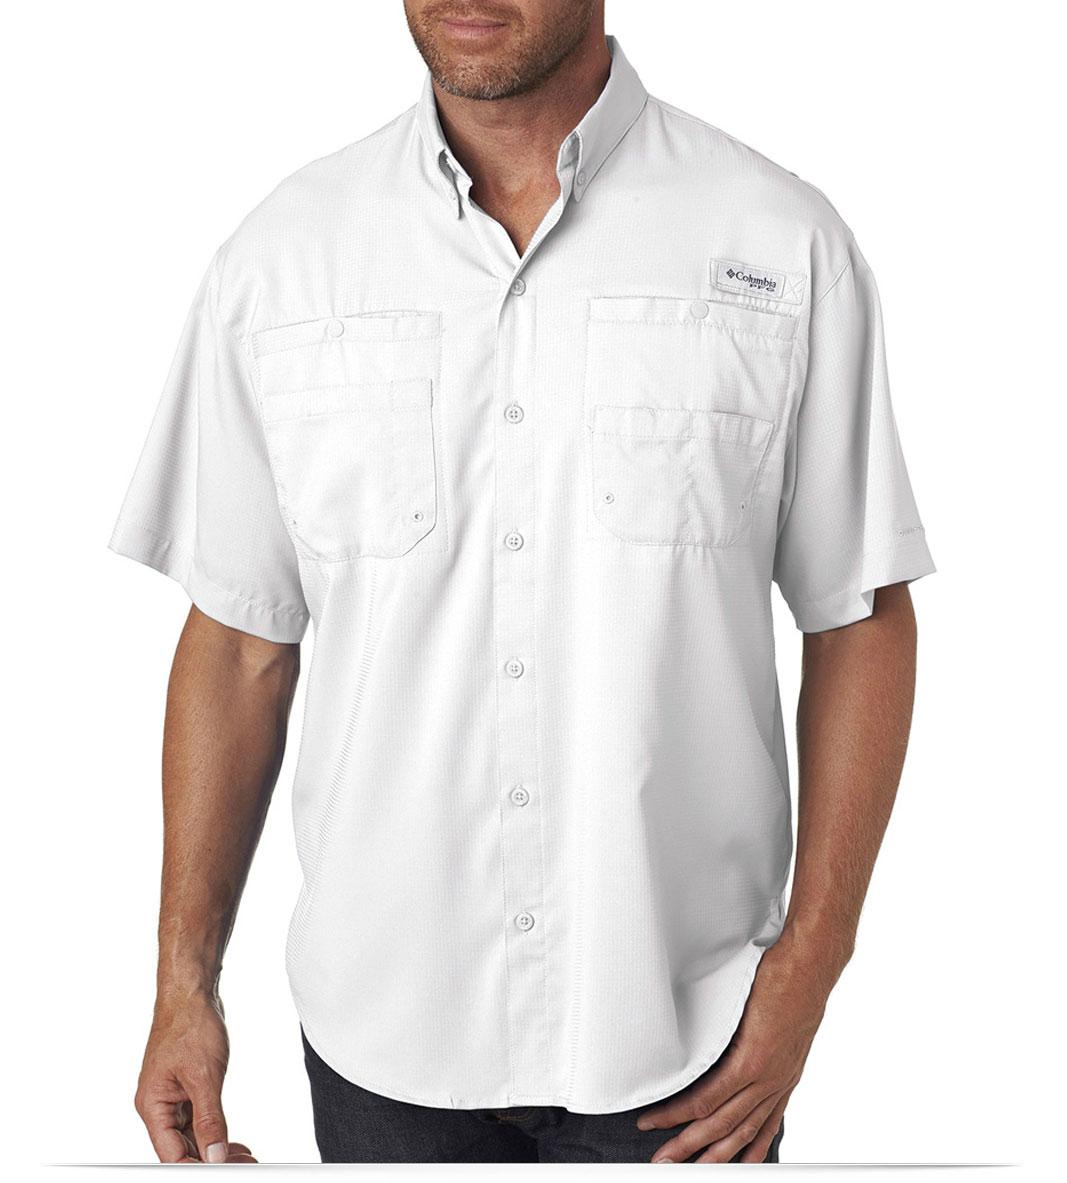 057260cf02720 Design Embroidered Columbia Men s Short-Sleeve Shirt Online